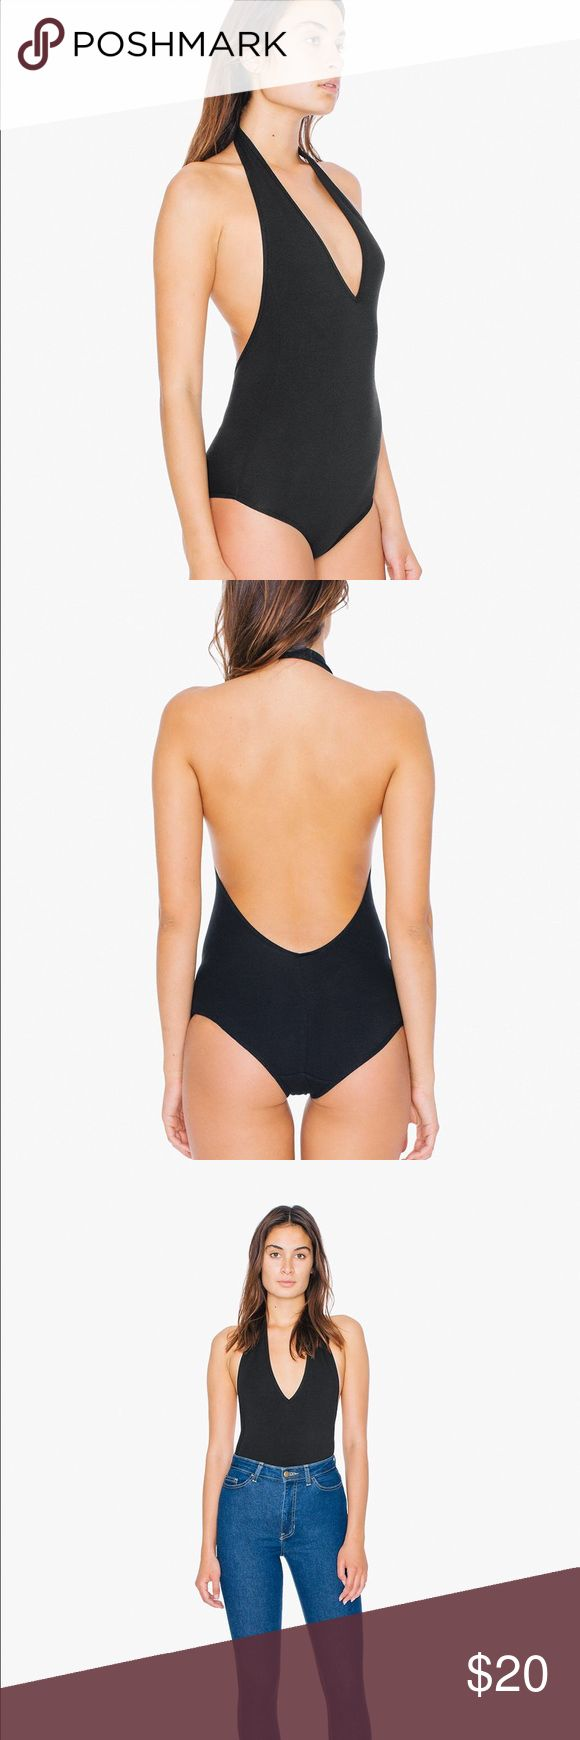 American Apparel Black Halter Low Cut Bodysuit Cotton spandex bodysuit by American Apparel. NWOT. Low V front and low back. Retails $35 American Apparel Tops Tank Tops